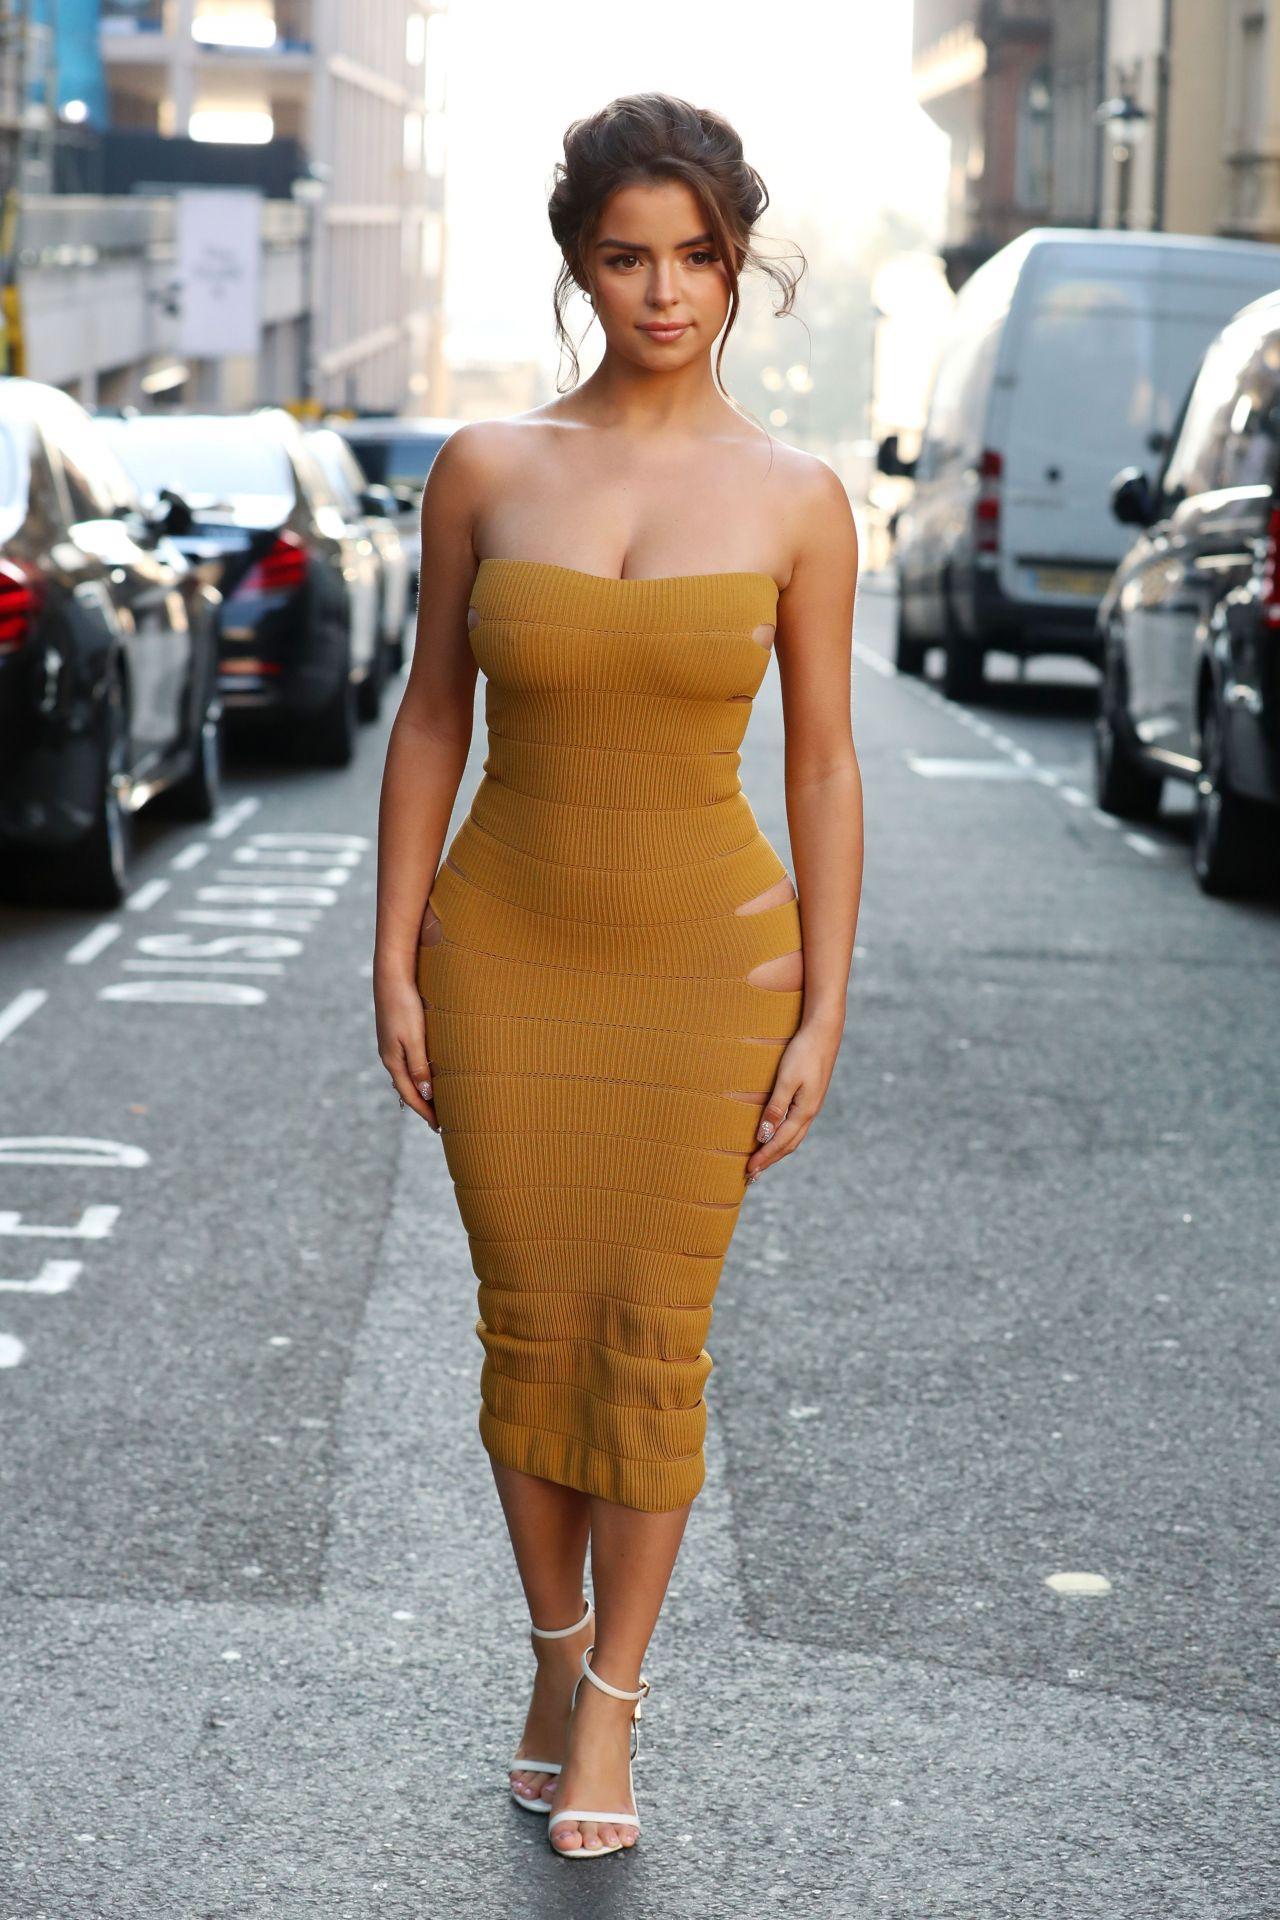 Demi Rose In Skin Tight Mustard Dress 02152019